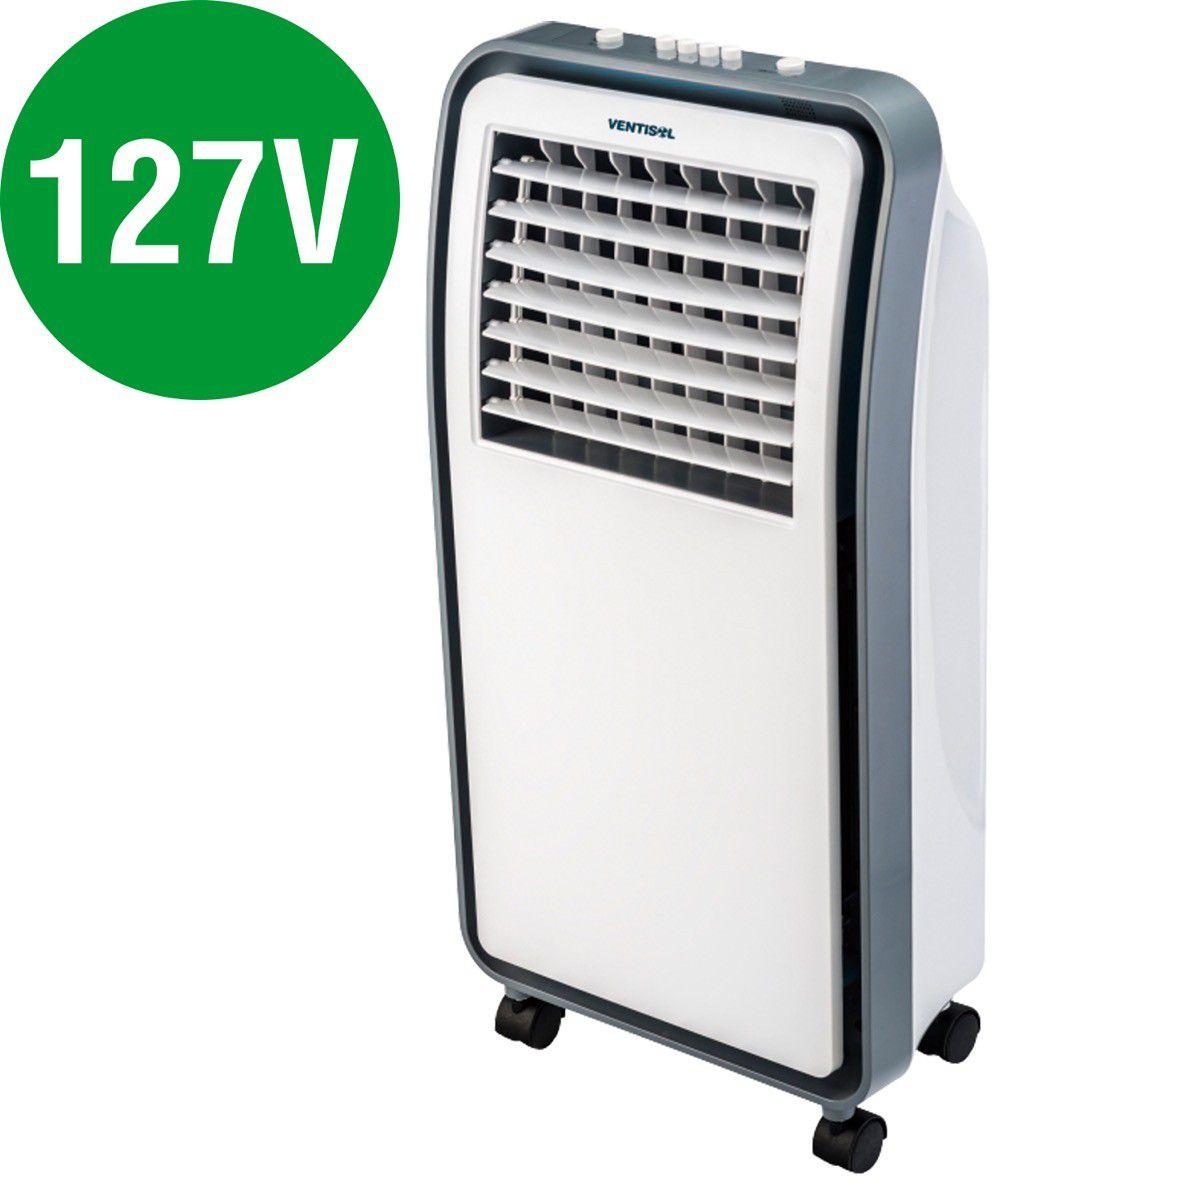 Ventilador Climatizador Ar Portatil 127V 65W Cle-01 Ventisol